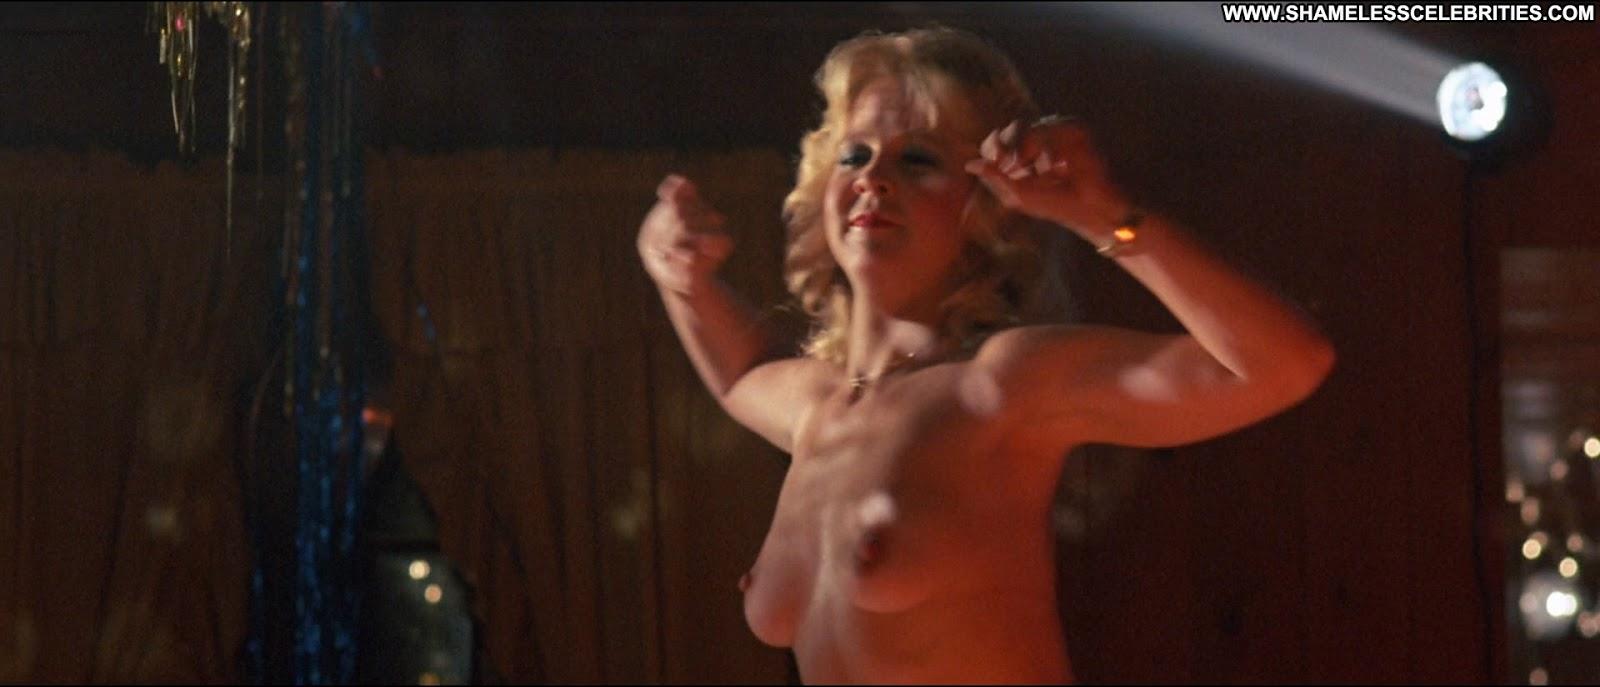 Mary stuart masterson topless